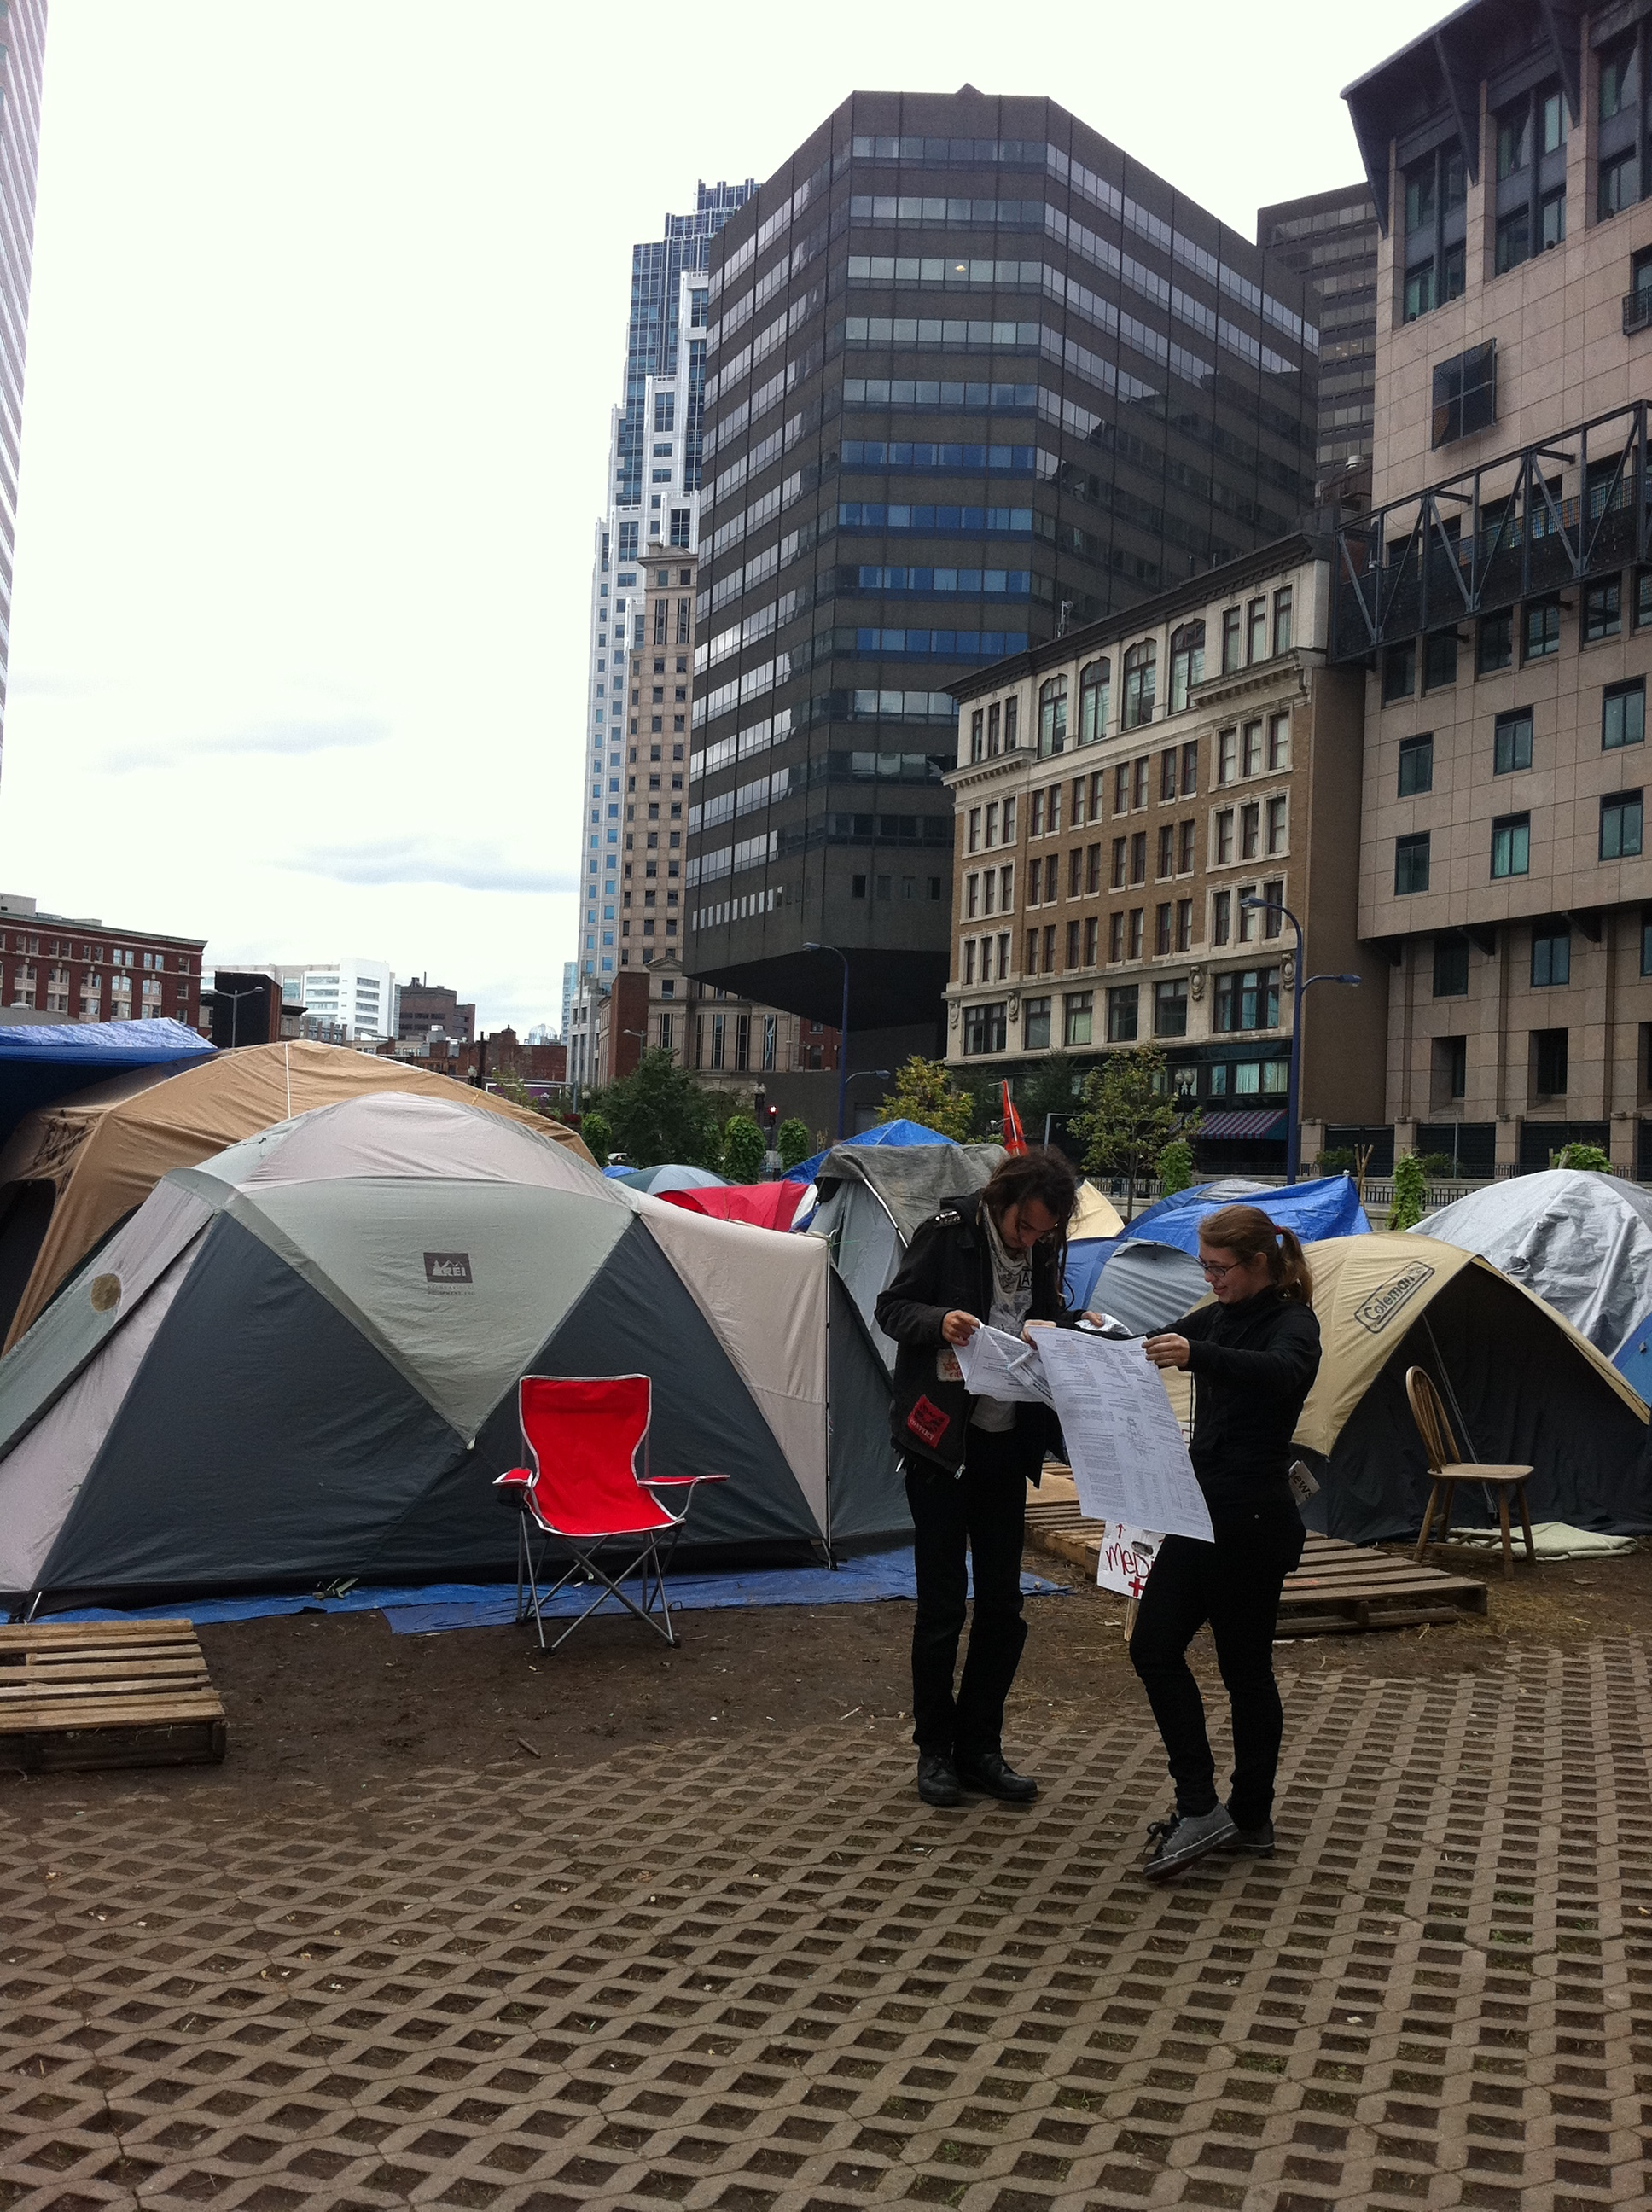 Information Bandana , intervention, Occupy Boston, Dewey Square, 2011